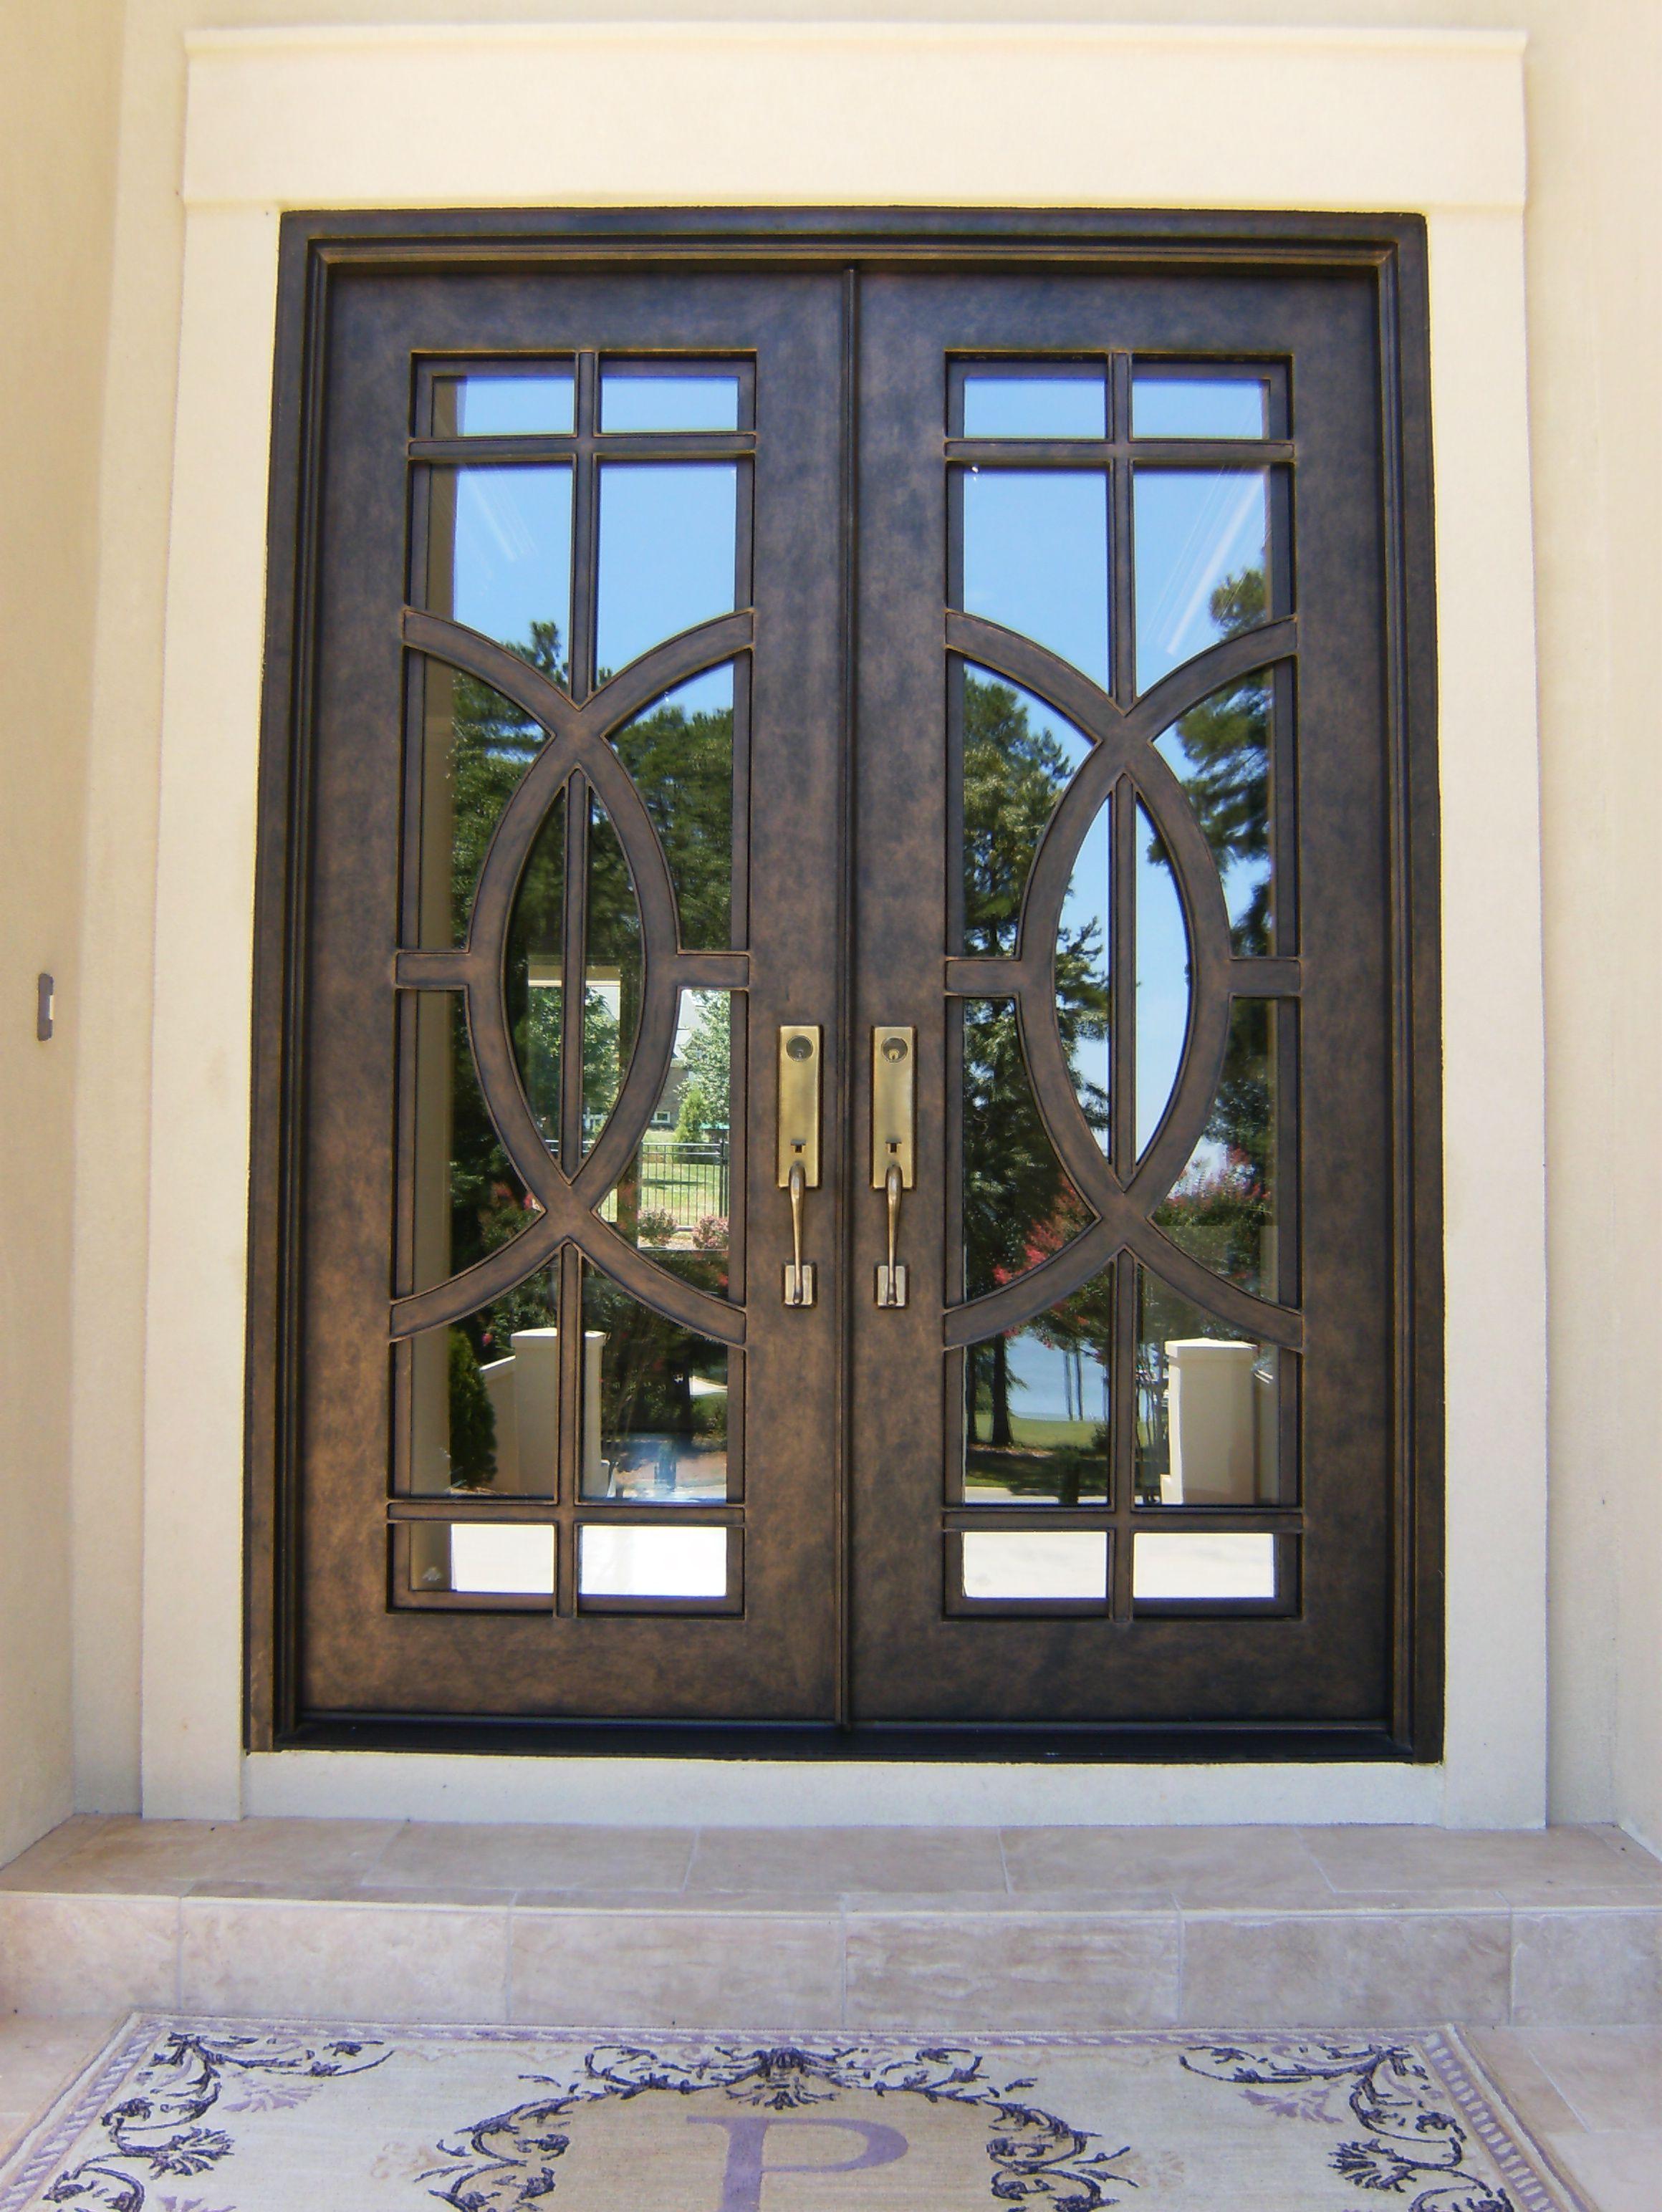 Arcadia Contemporary Custom Iron Door Custom Front Entry Doors Iron Doors Iron Door Design